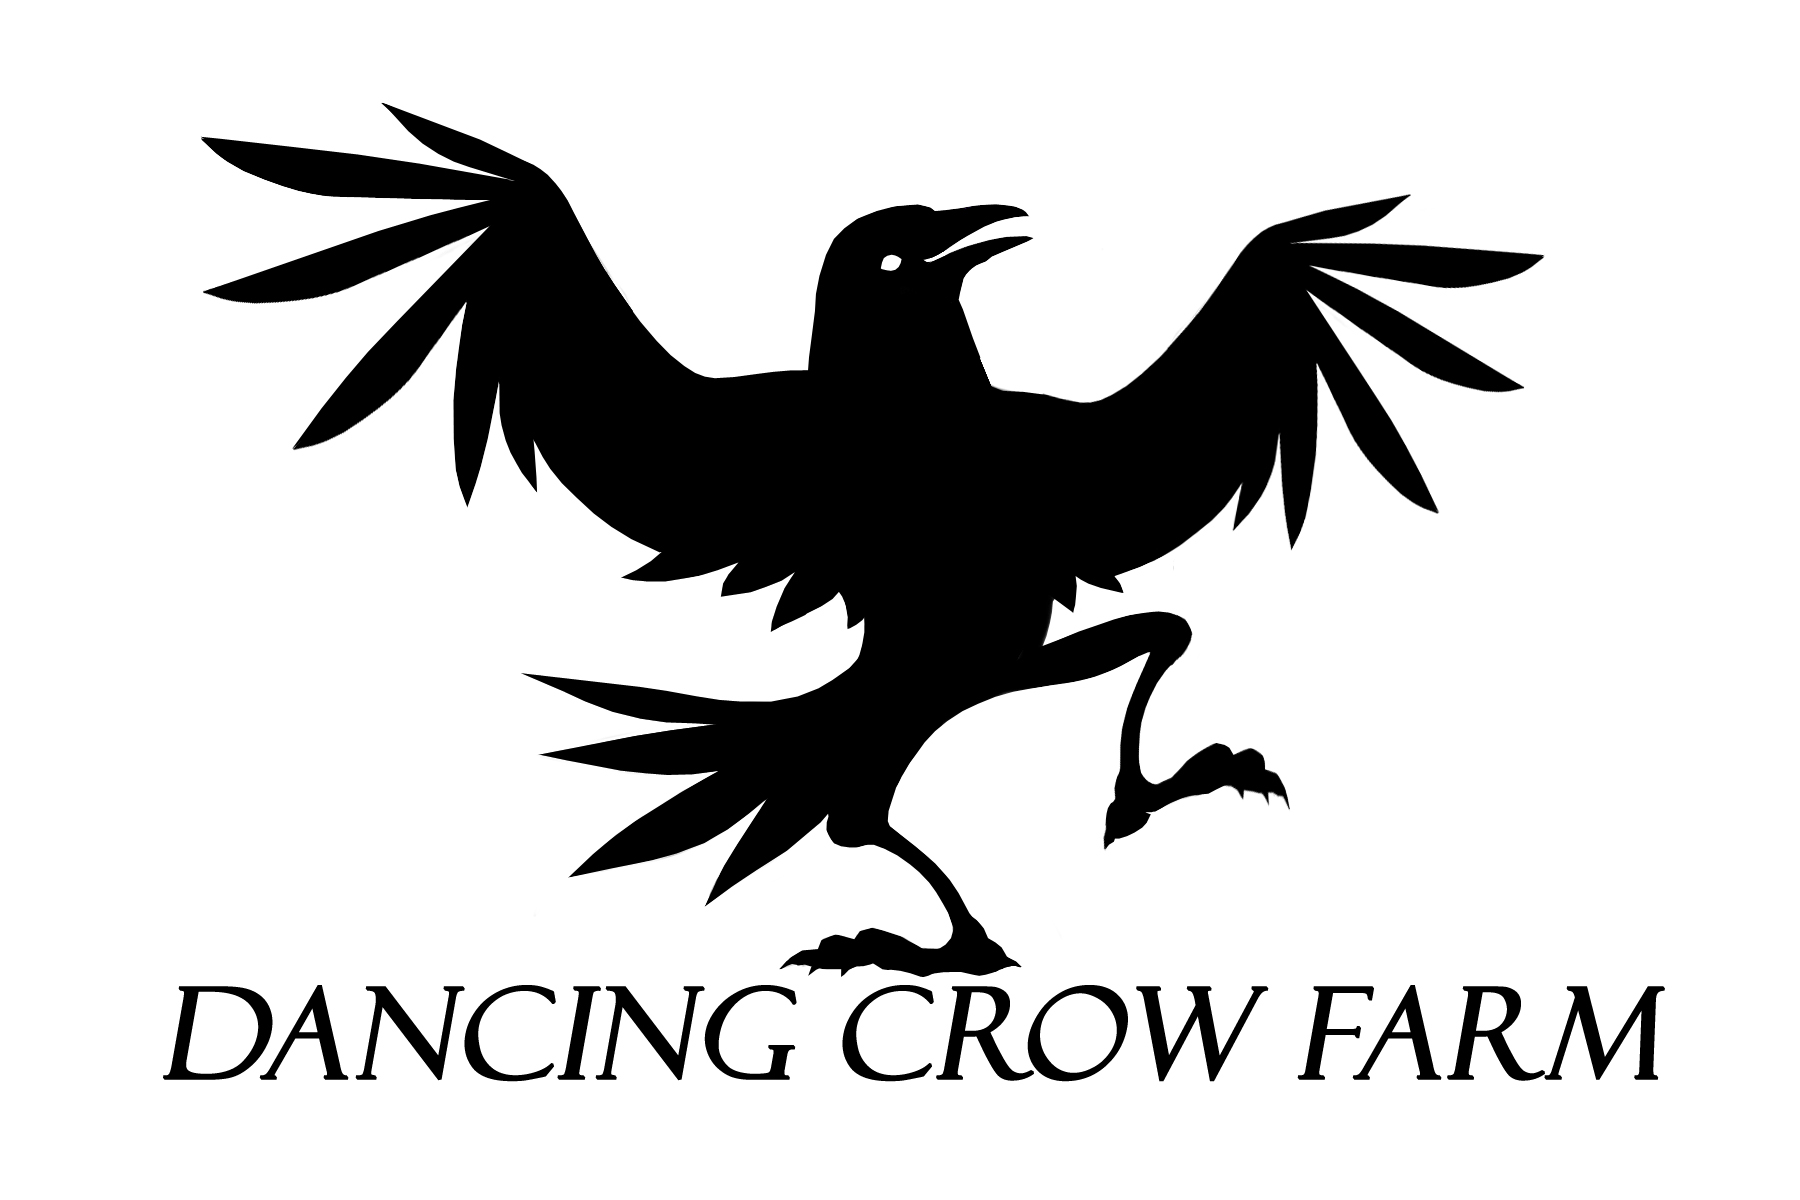 Dancing_Crow_Farm_Crow_Black_wText_Reverse.jpg